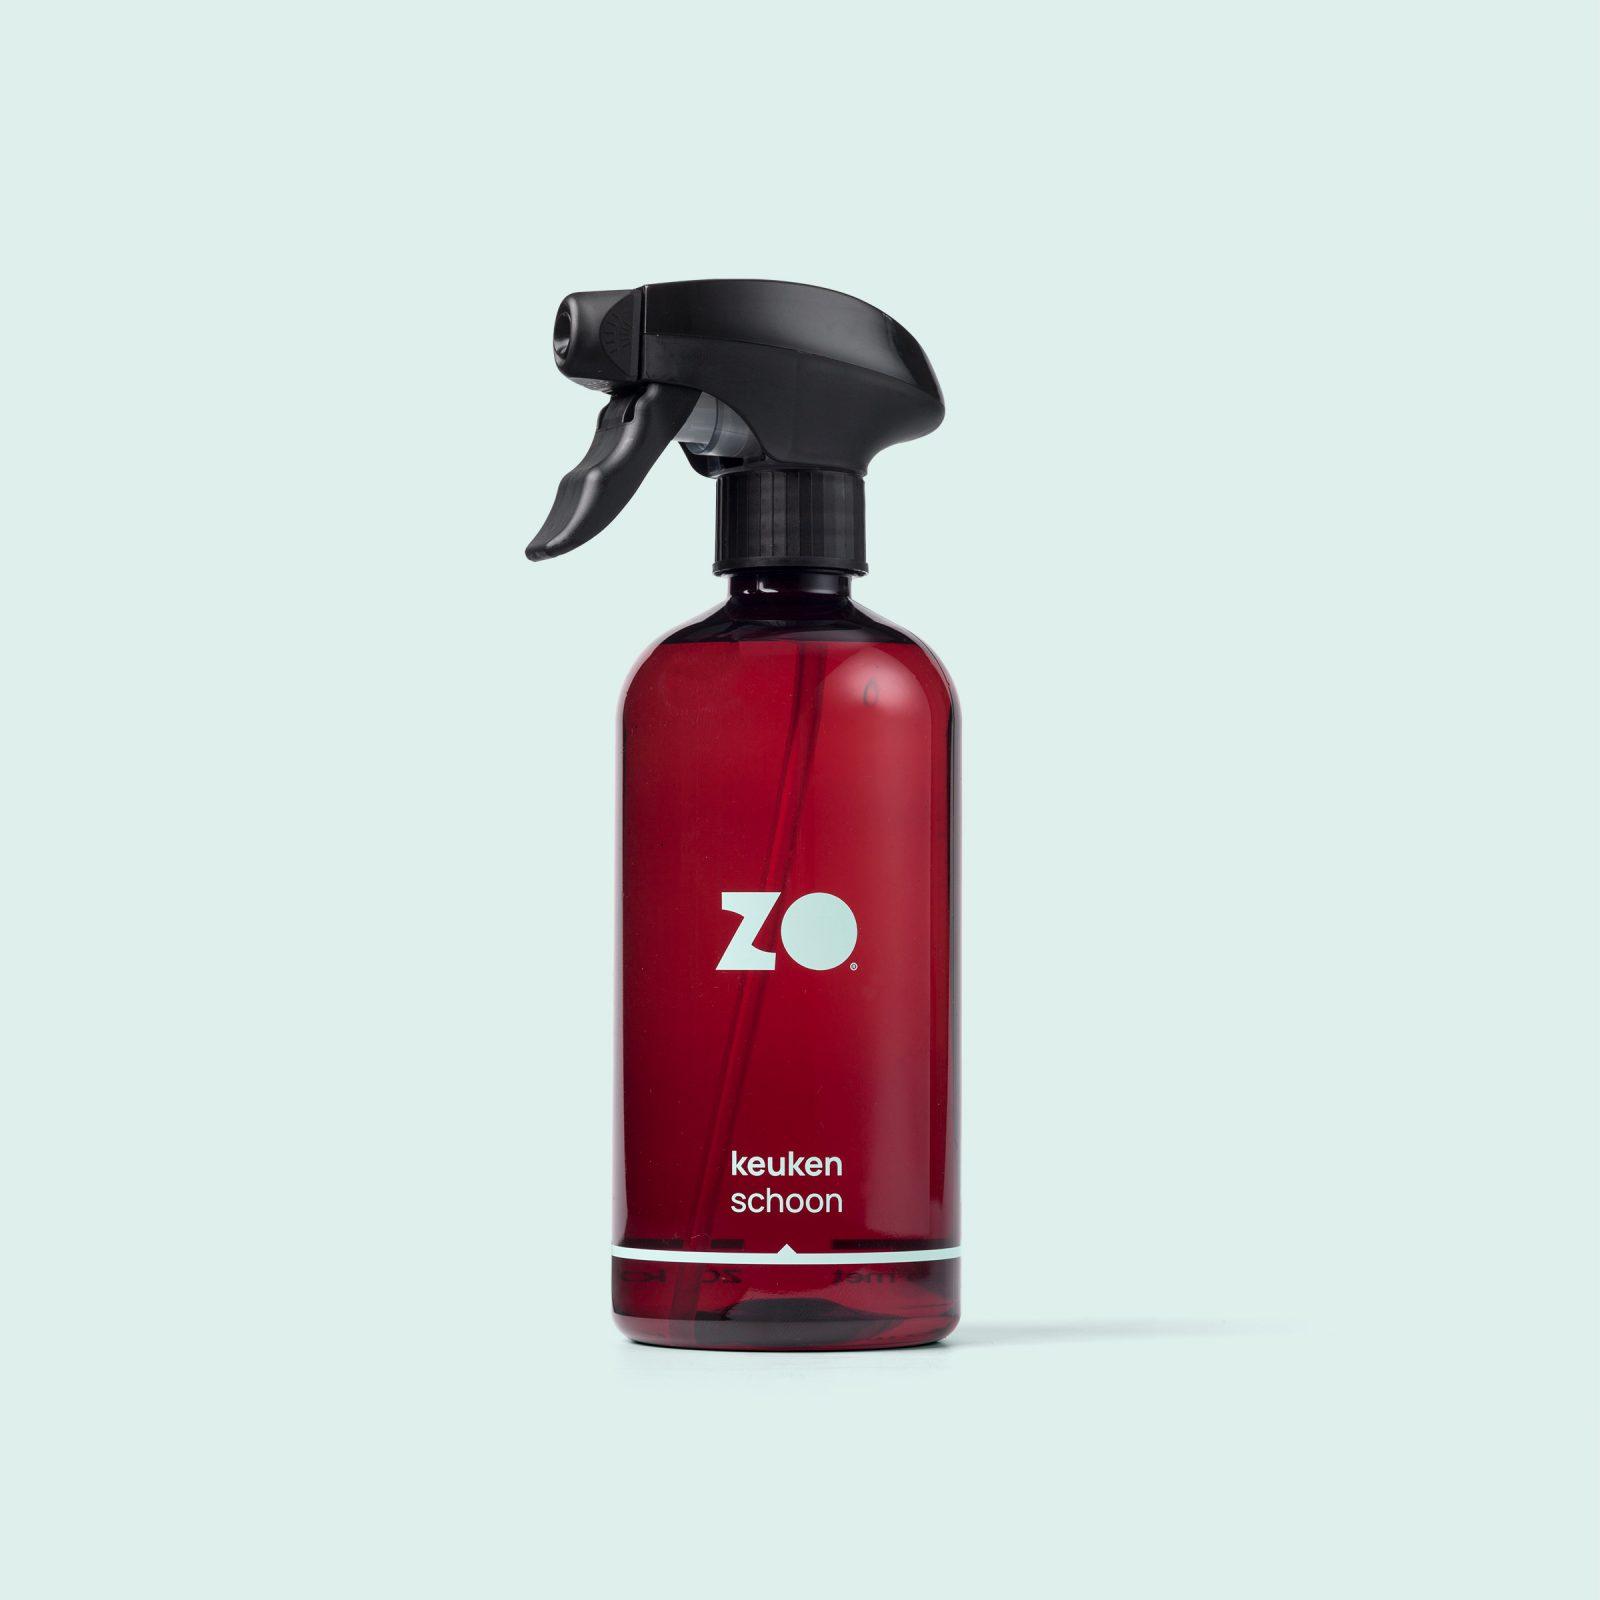 ZO keuken sprayer